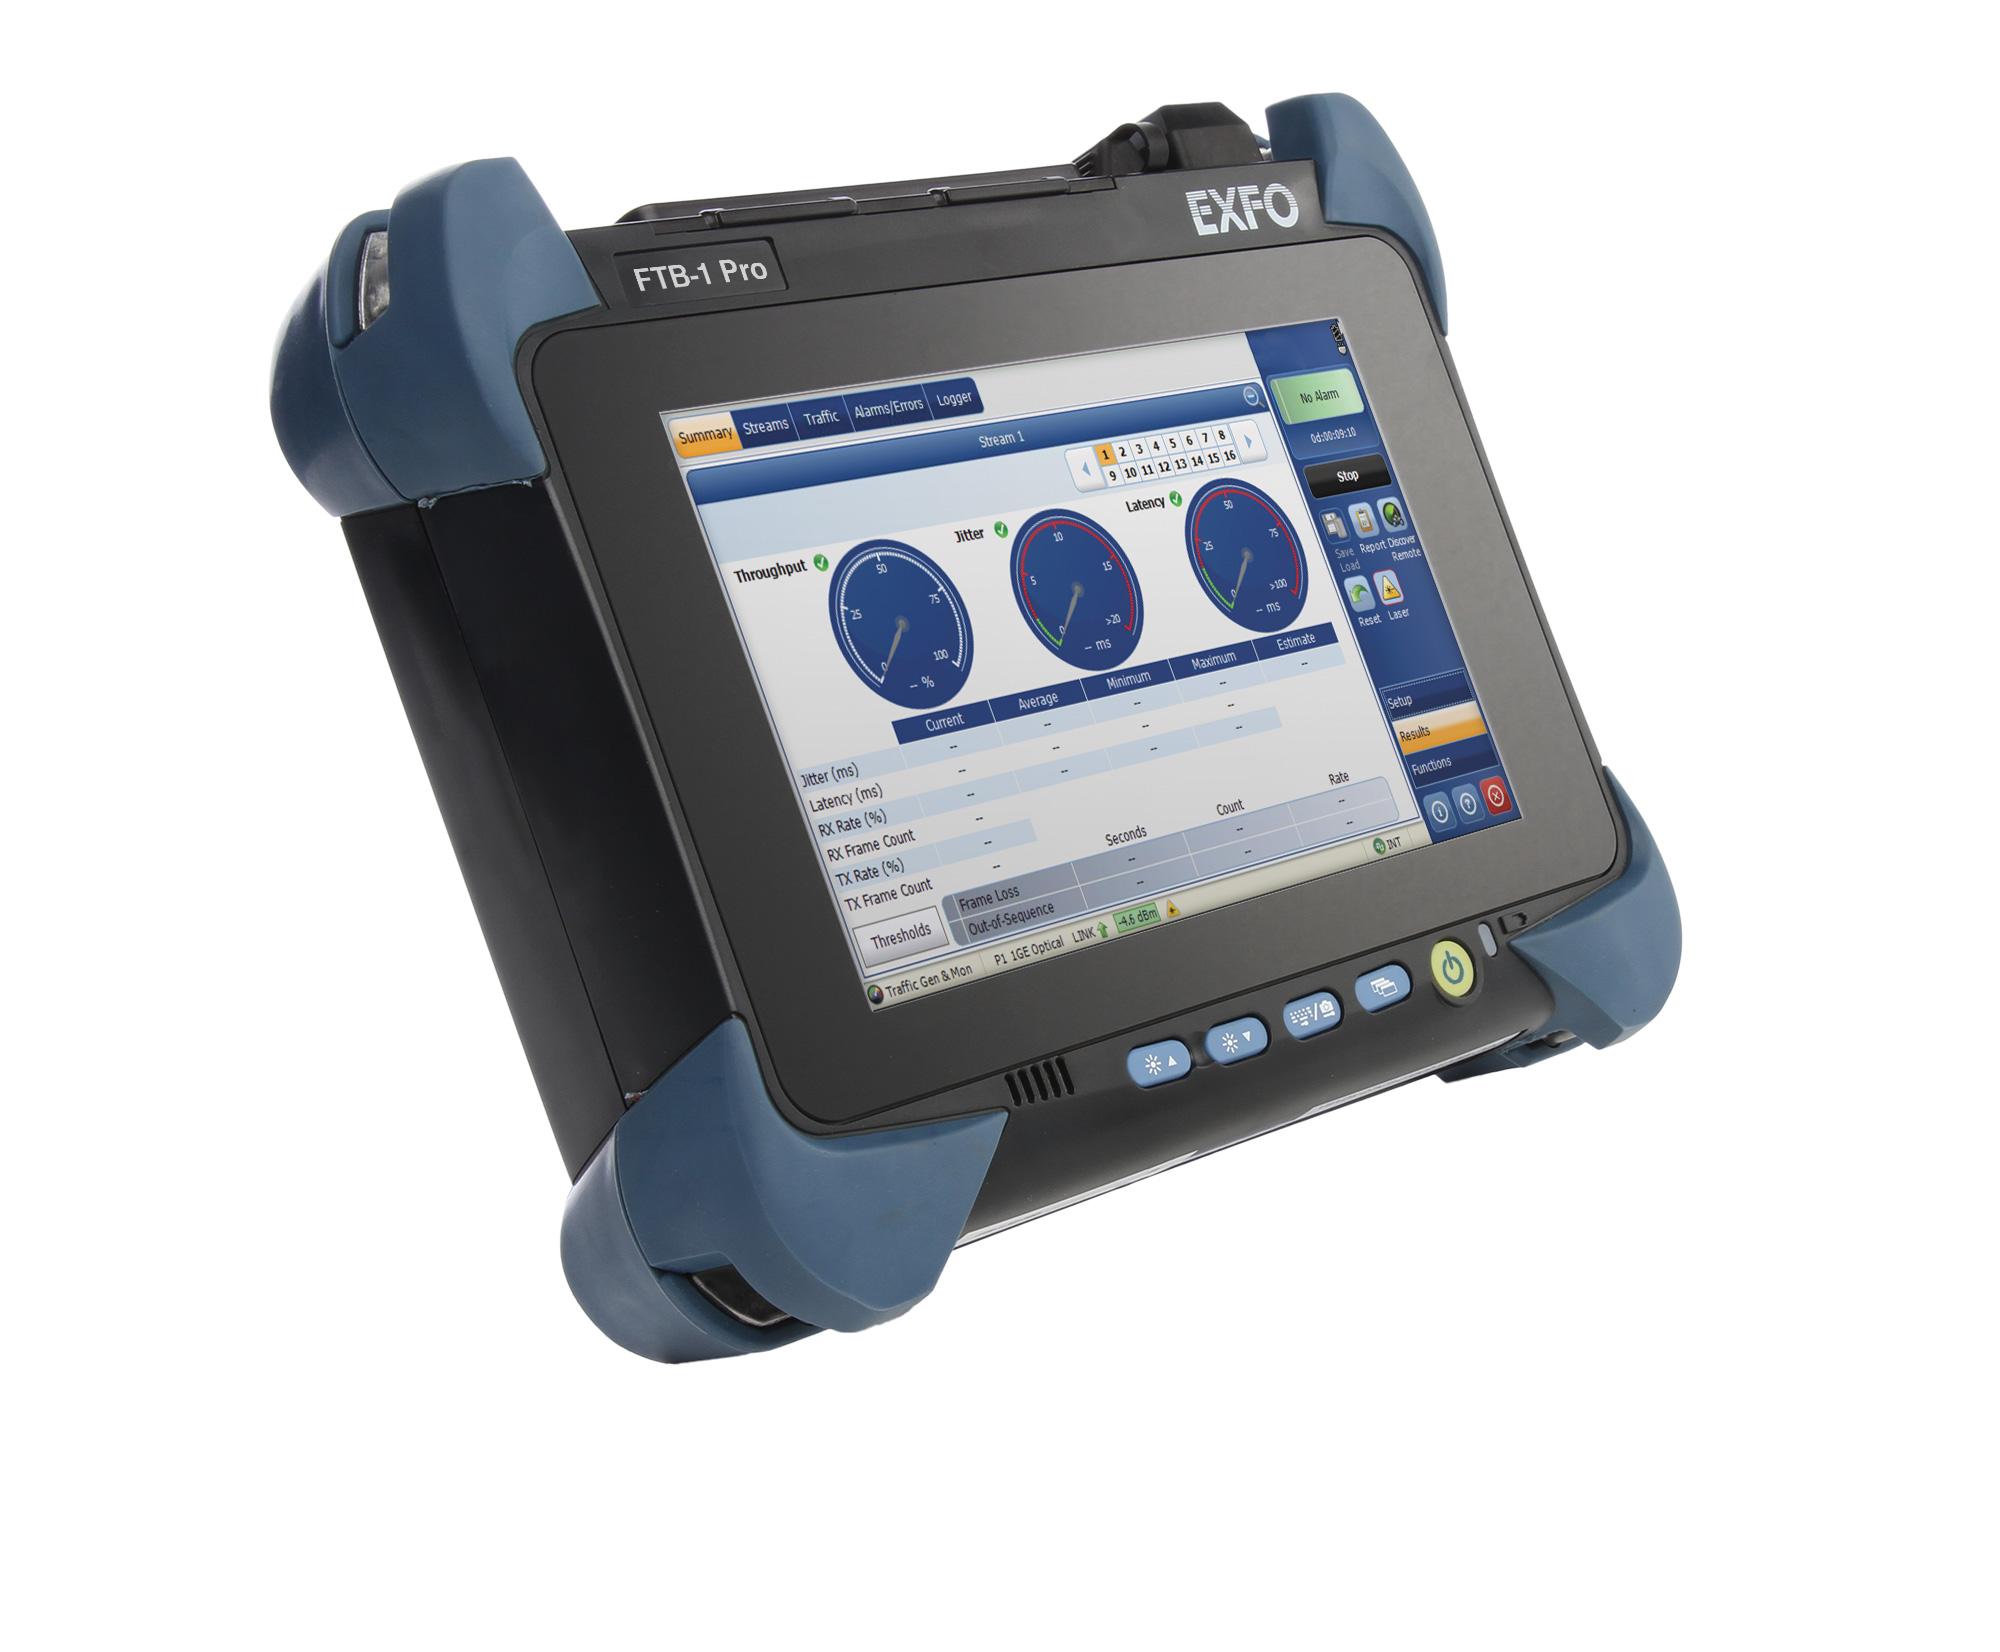 FTB-1v2/Pro | Portable test platform